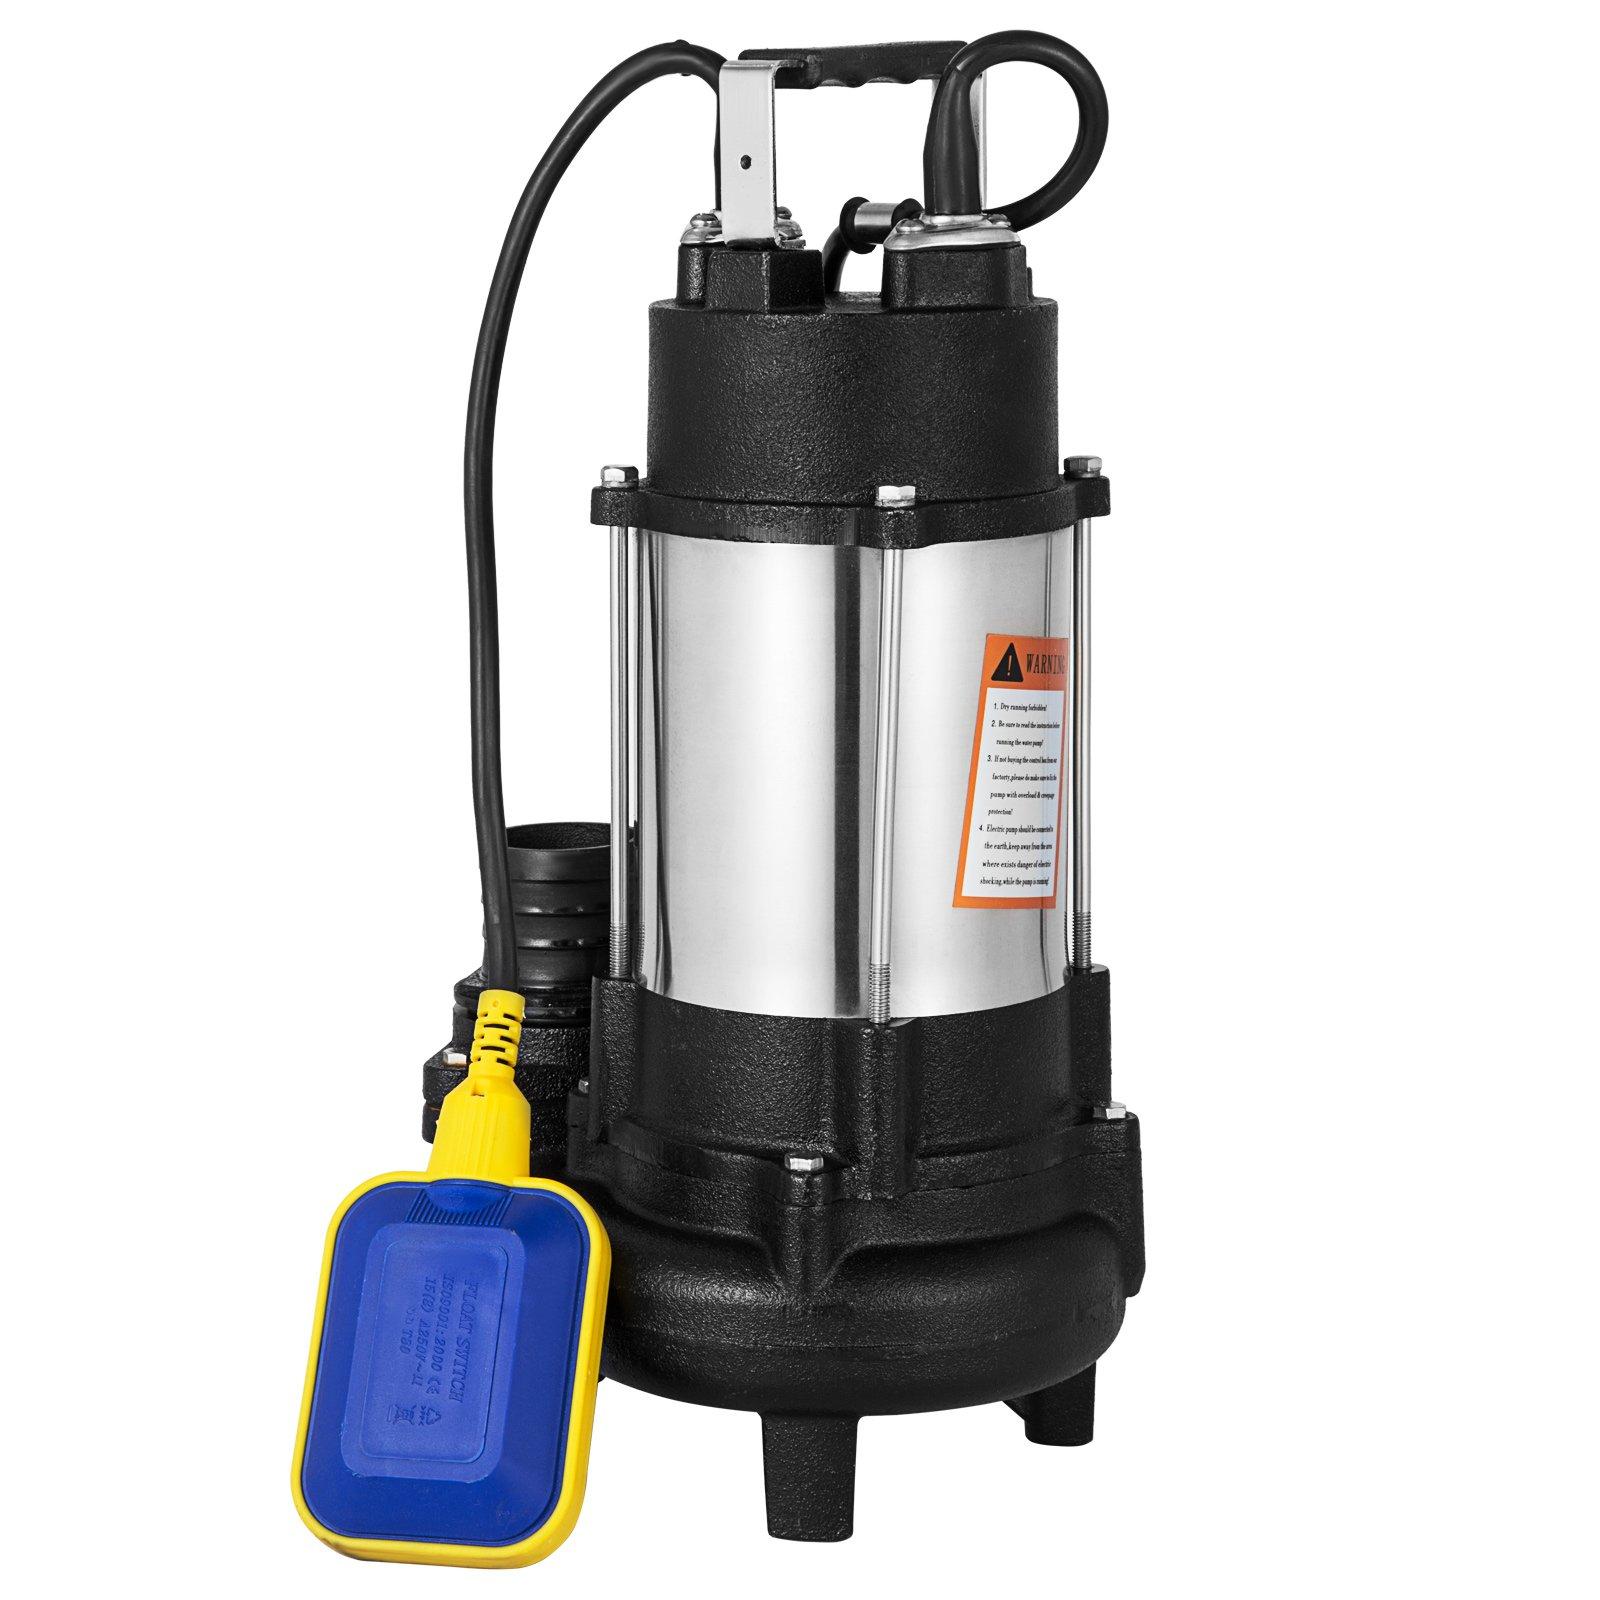 Happybuy Submersible Sewage Pump VD-550F 3/4 HP Sewage Pump Heavy Duty Deep Well Water Pump 5600 GPH Dirty Clean Water Pump